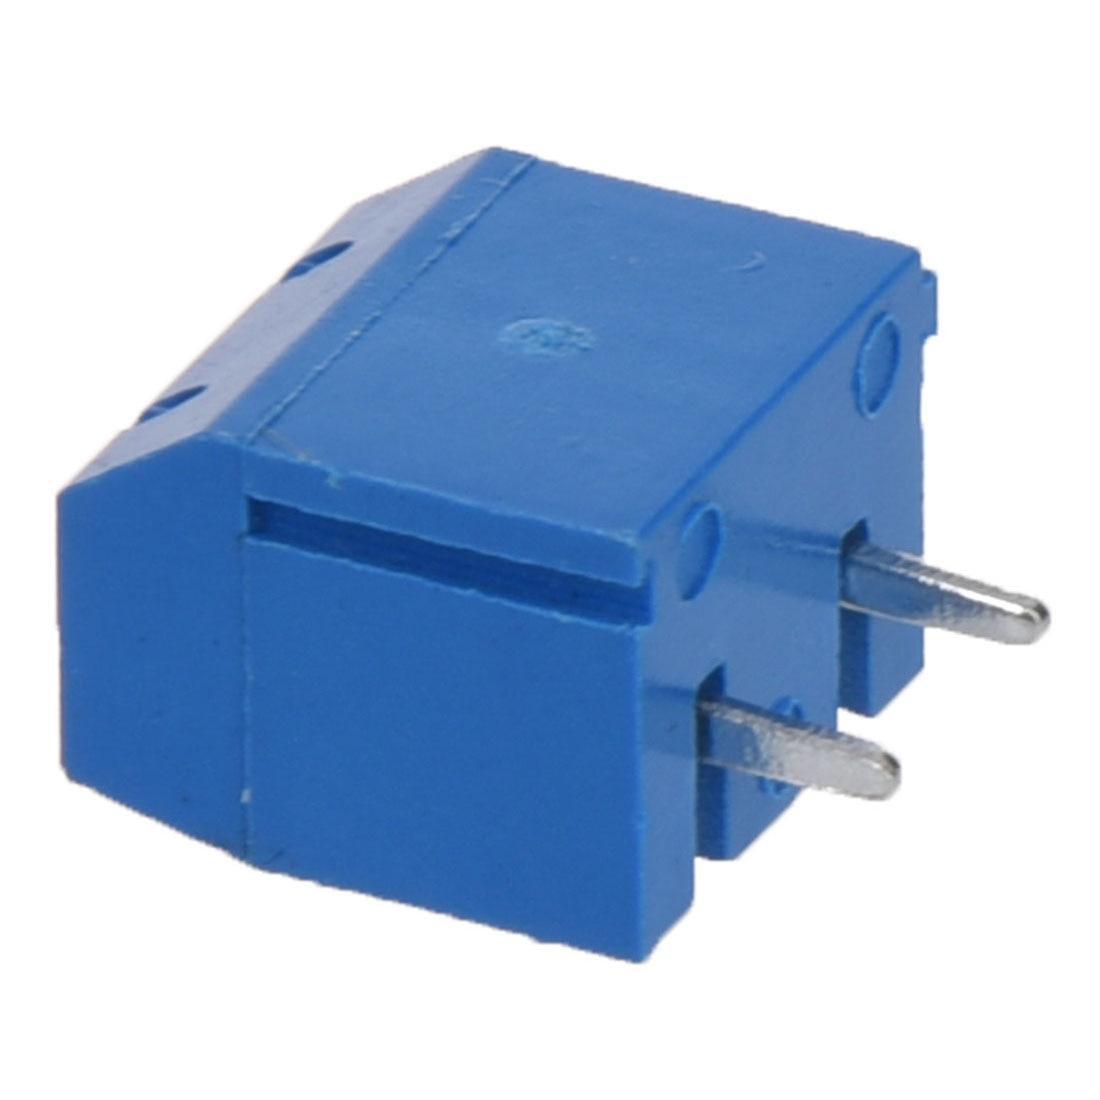 5 Pcs 2P 5mm Pitch PCB Screw Terminal Block Connector